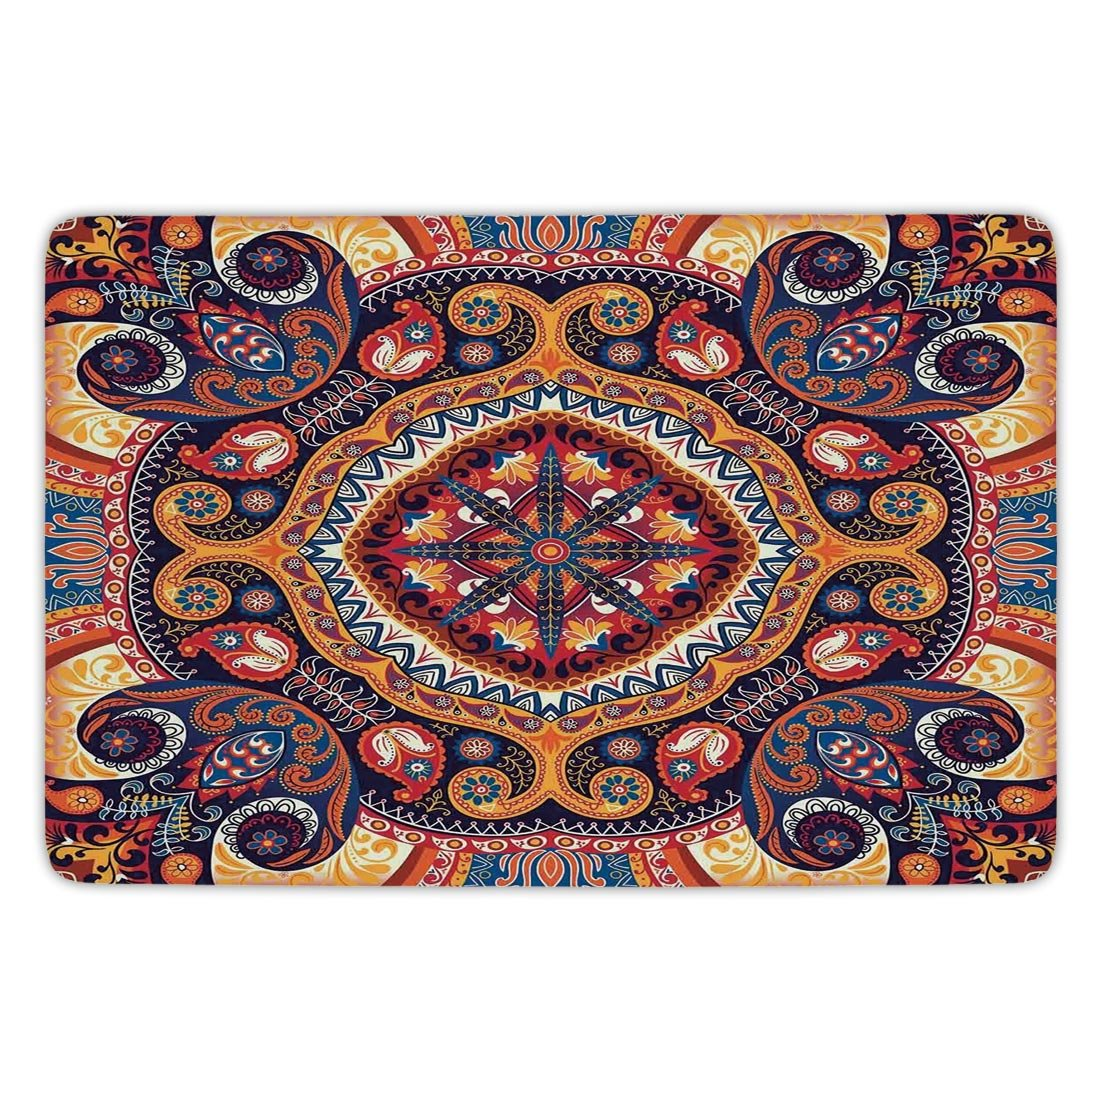 amazon com bathroom bath rug kitchen floor mat carpet paisley decor rh amazon com